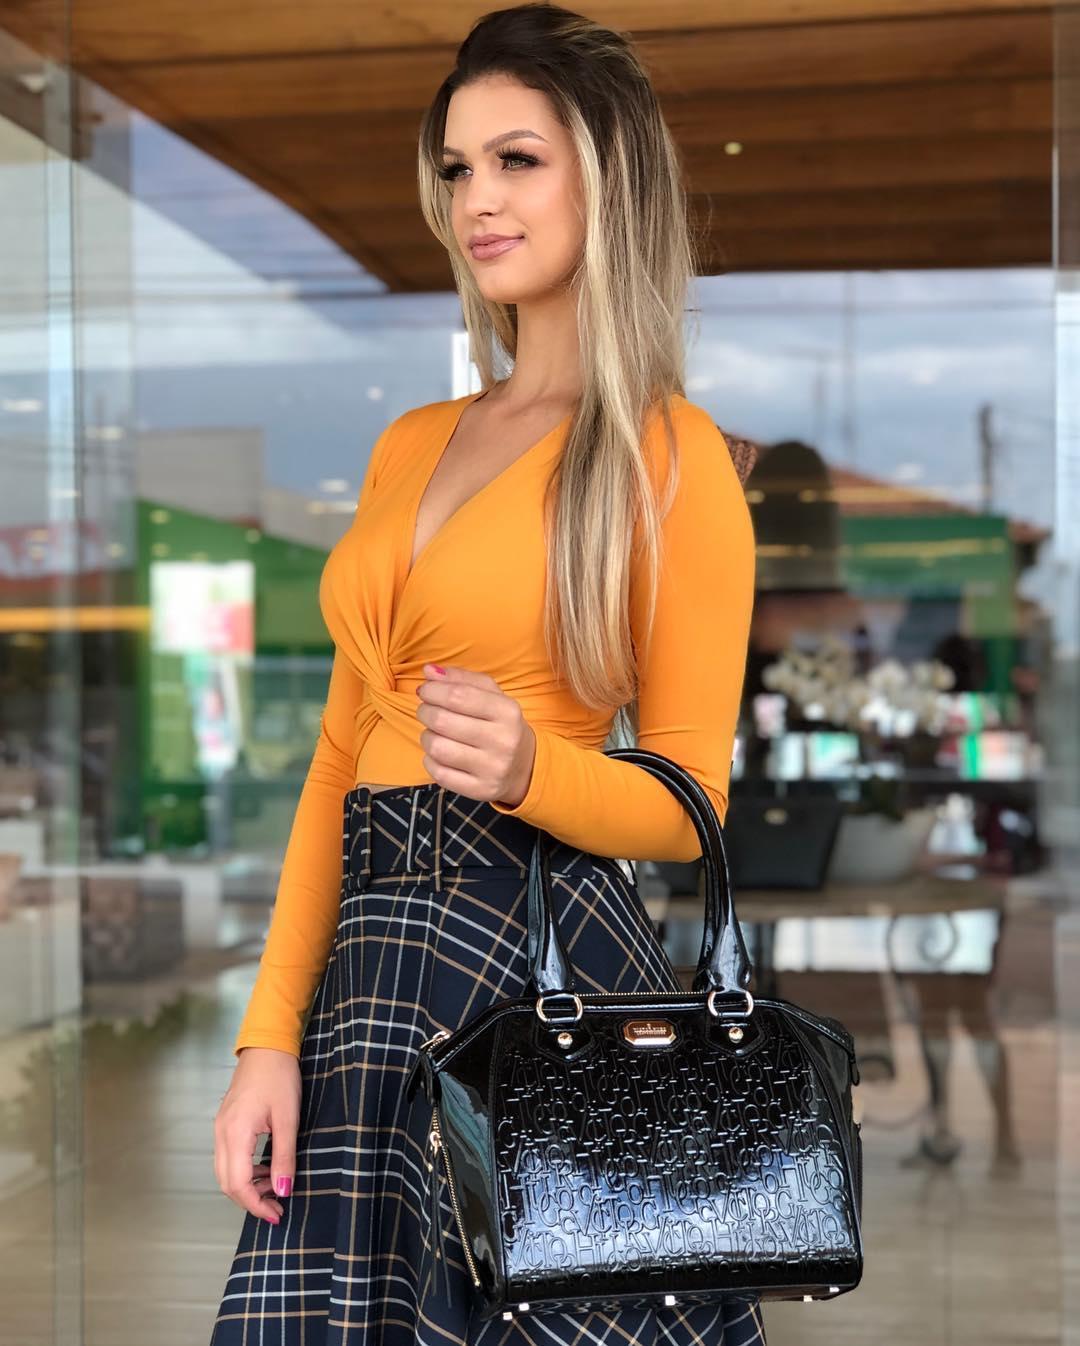 maria gabriela batistela, miss brasil terra 2019. - Página 6 52120312